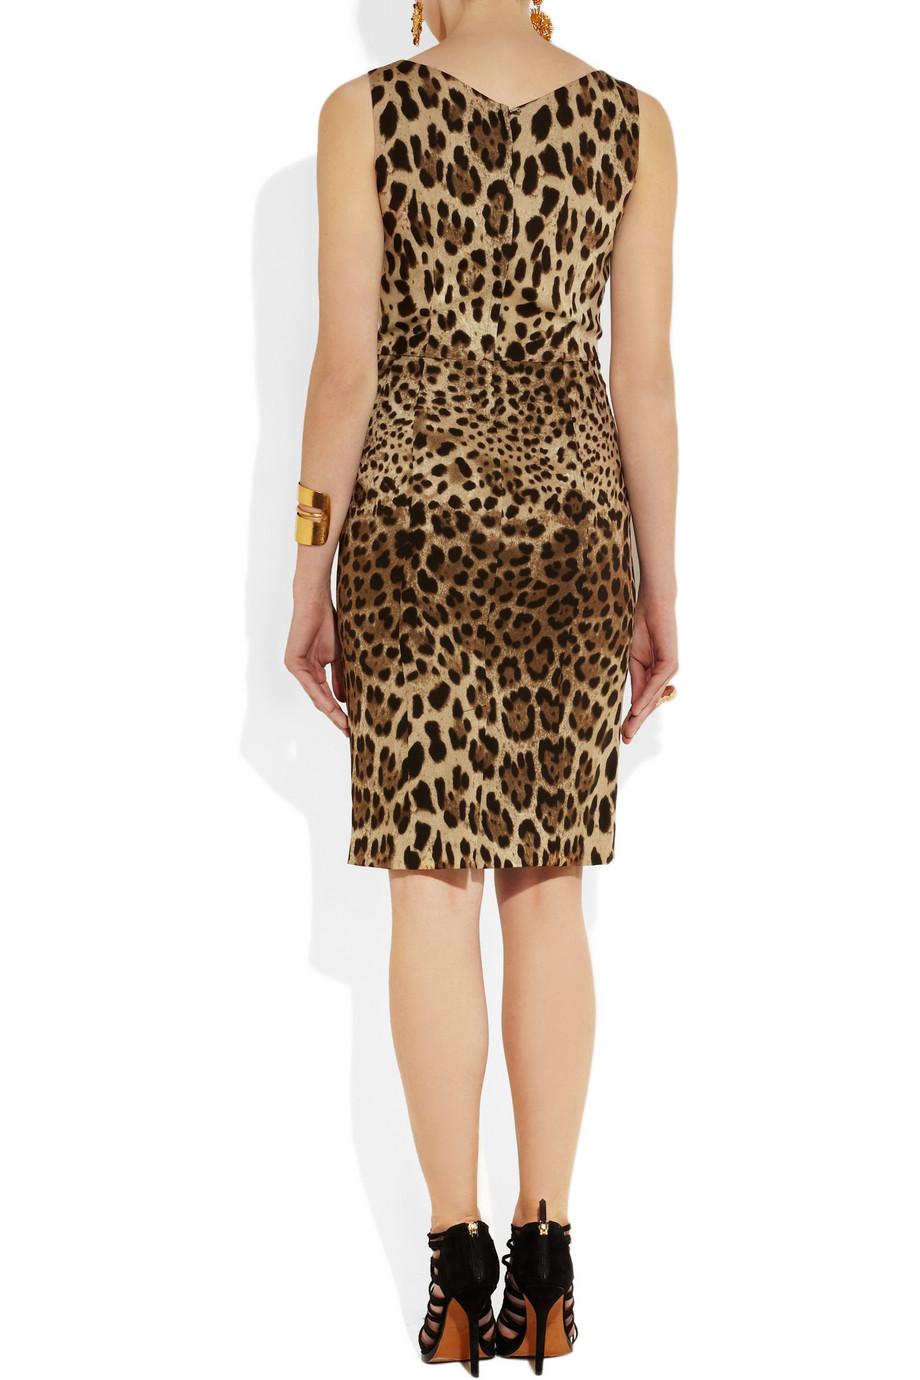 Dolce & gabbana Leopardprint Crepe Dress in Brown